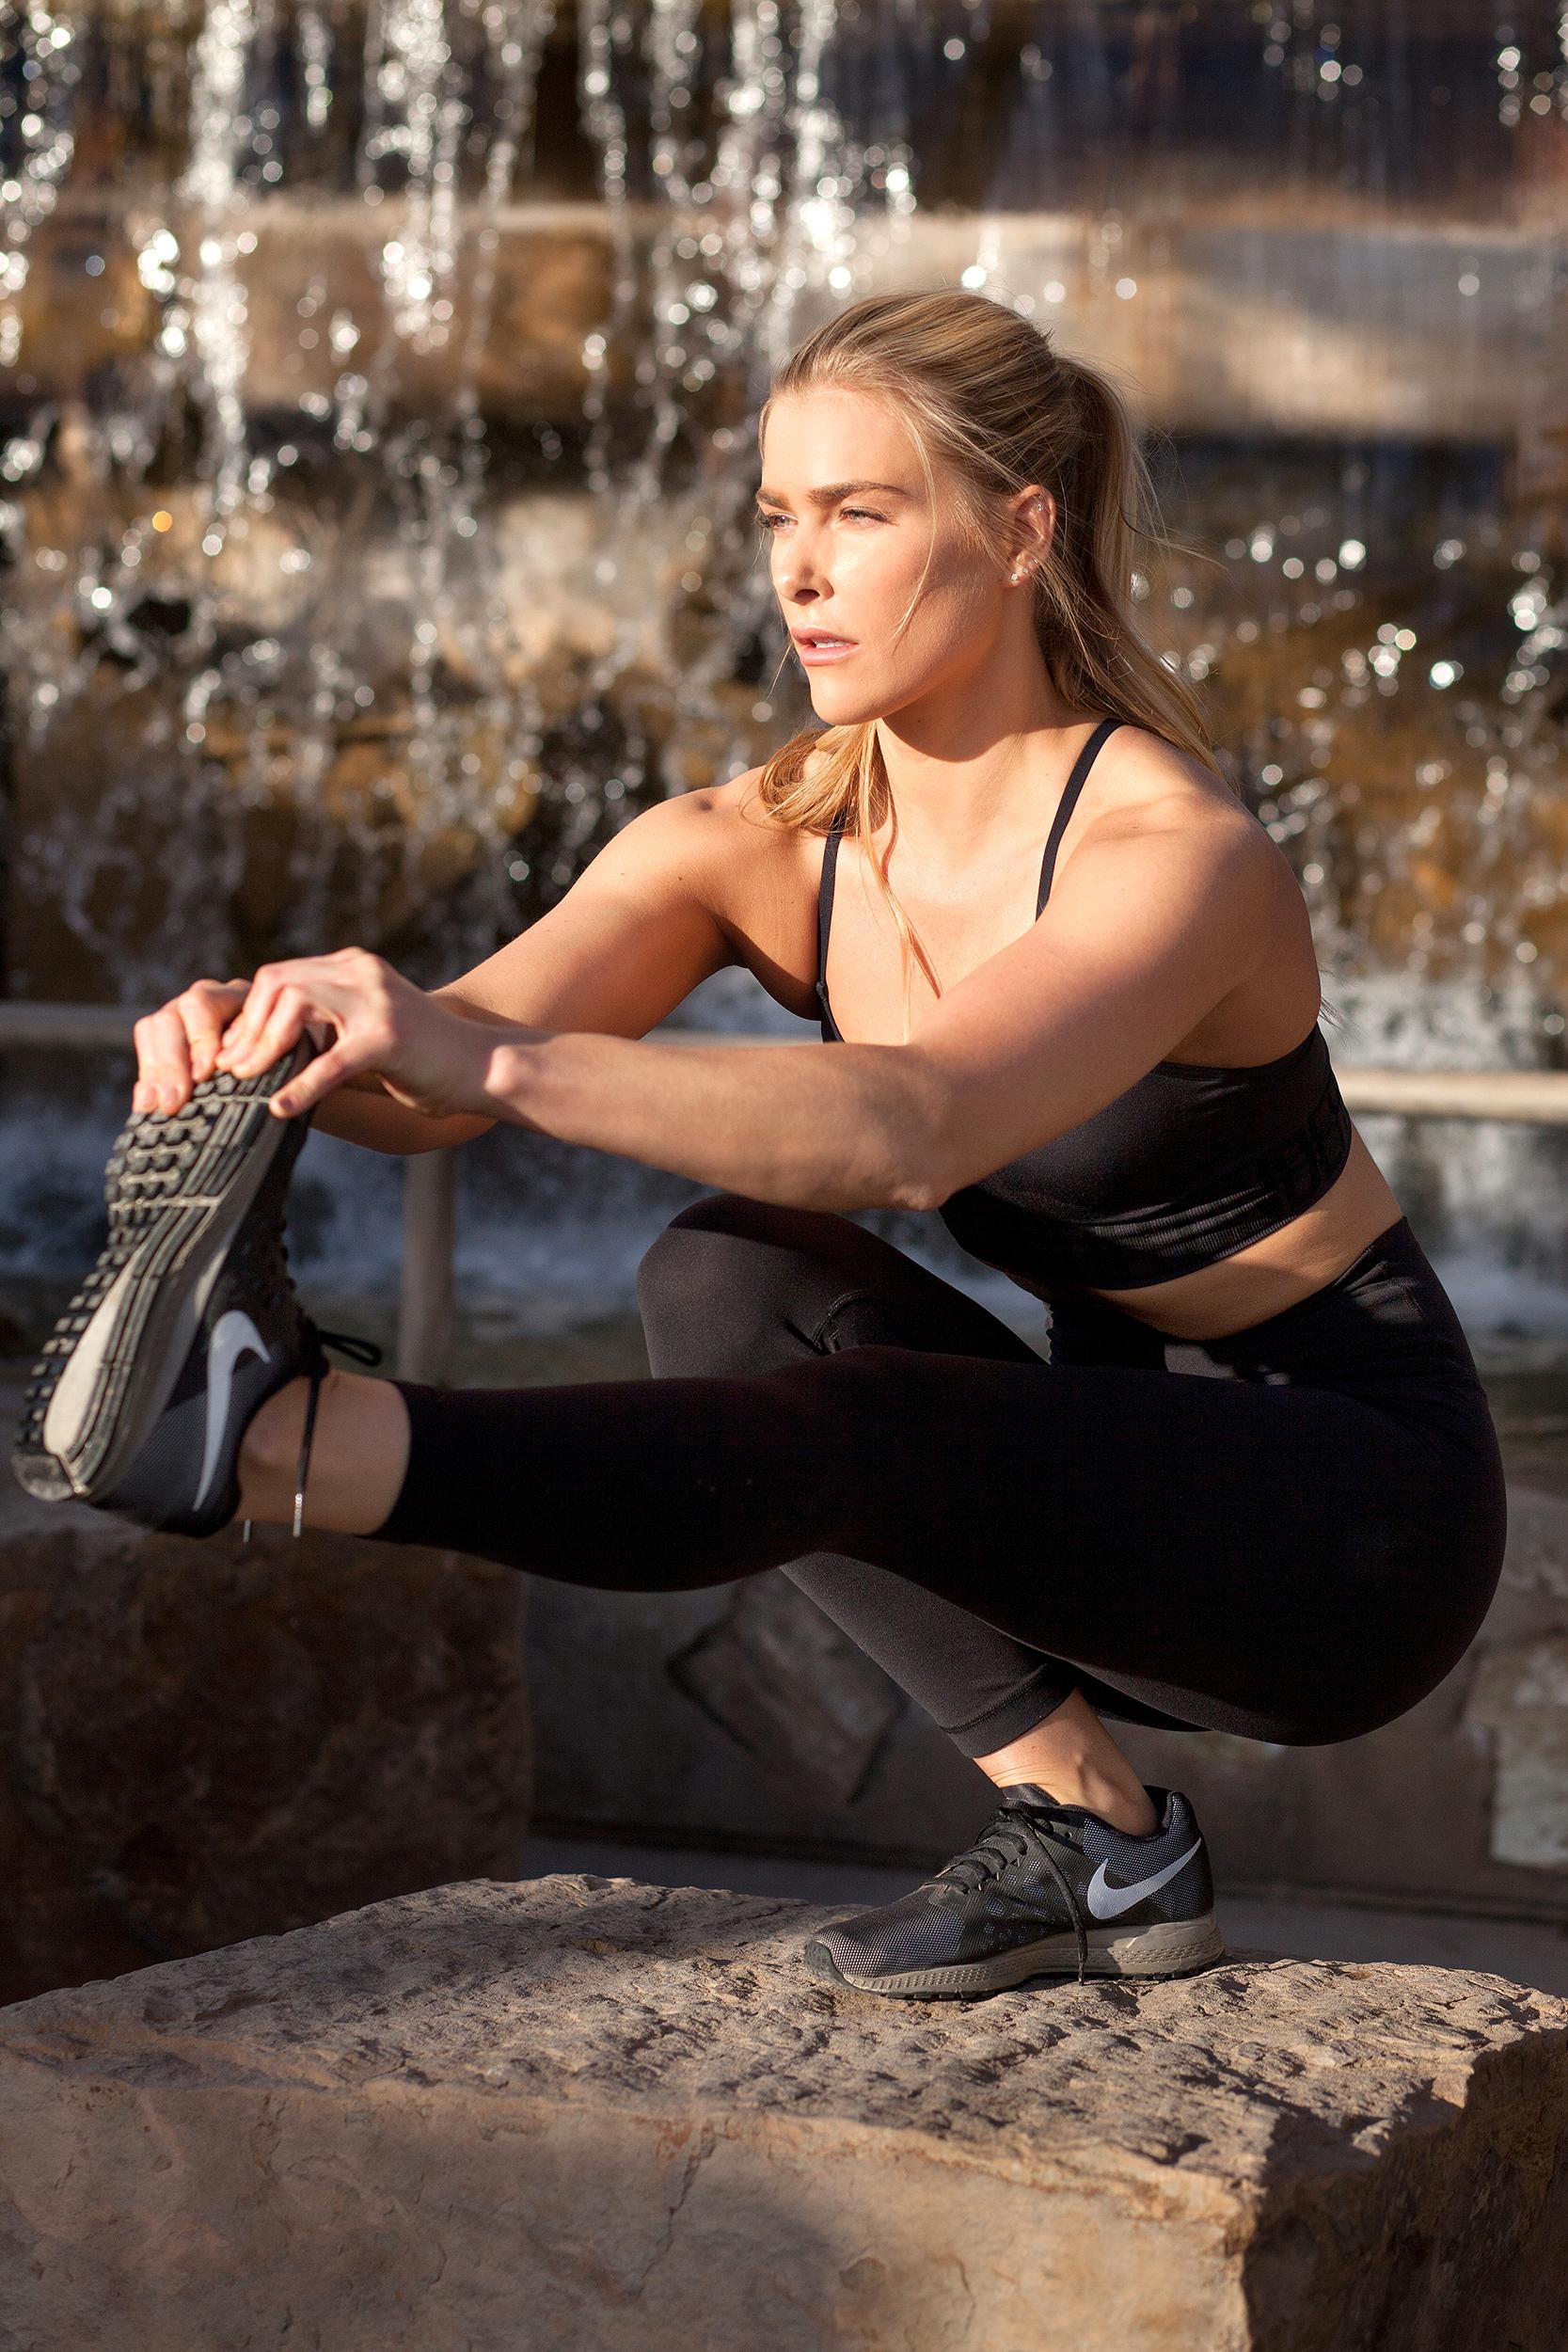 WEB_Anderson Fitness Model-0139.jpg